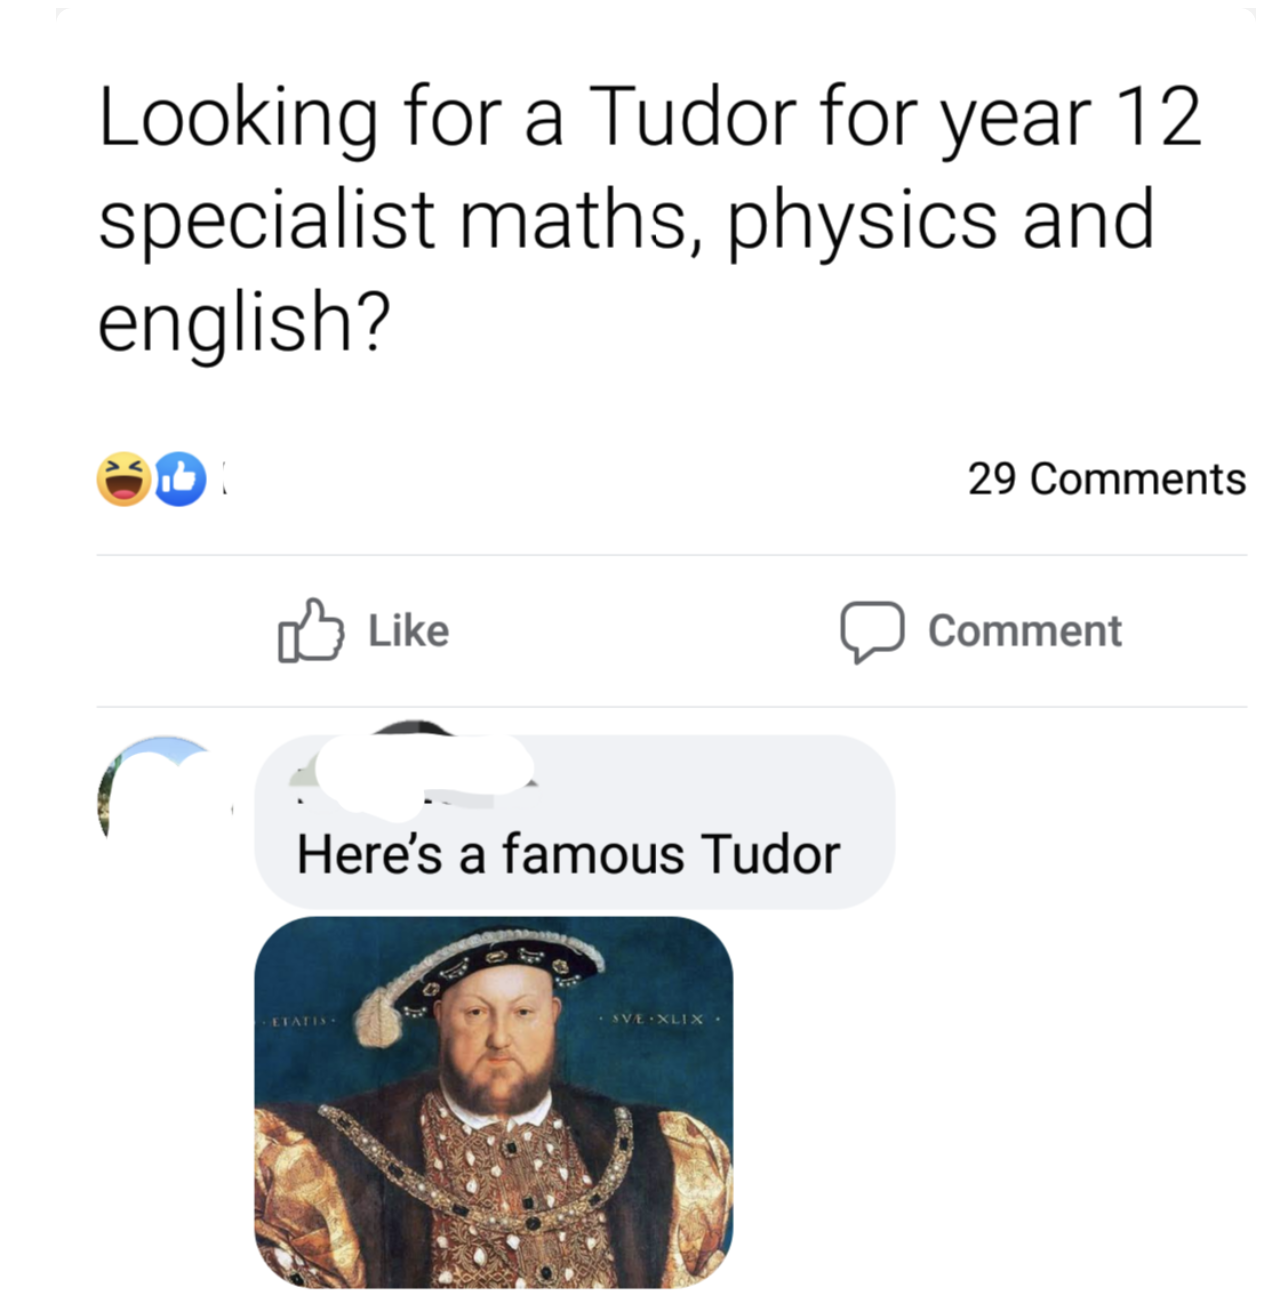 person who mispells tutor as tudor